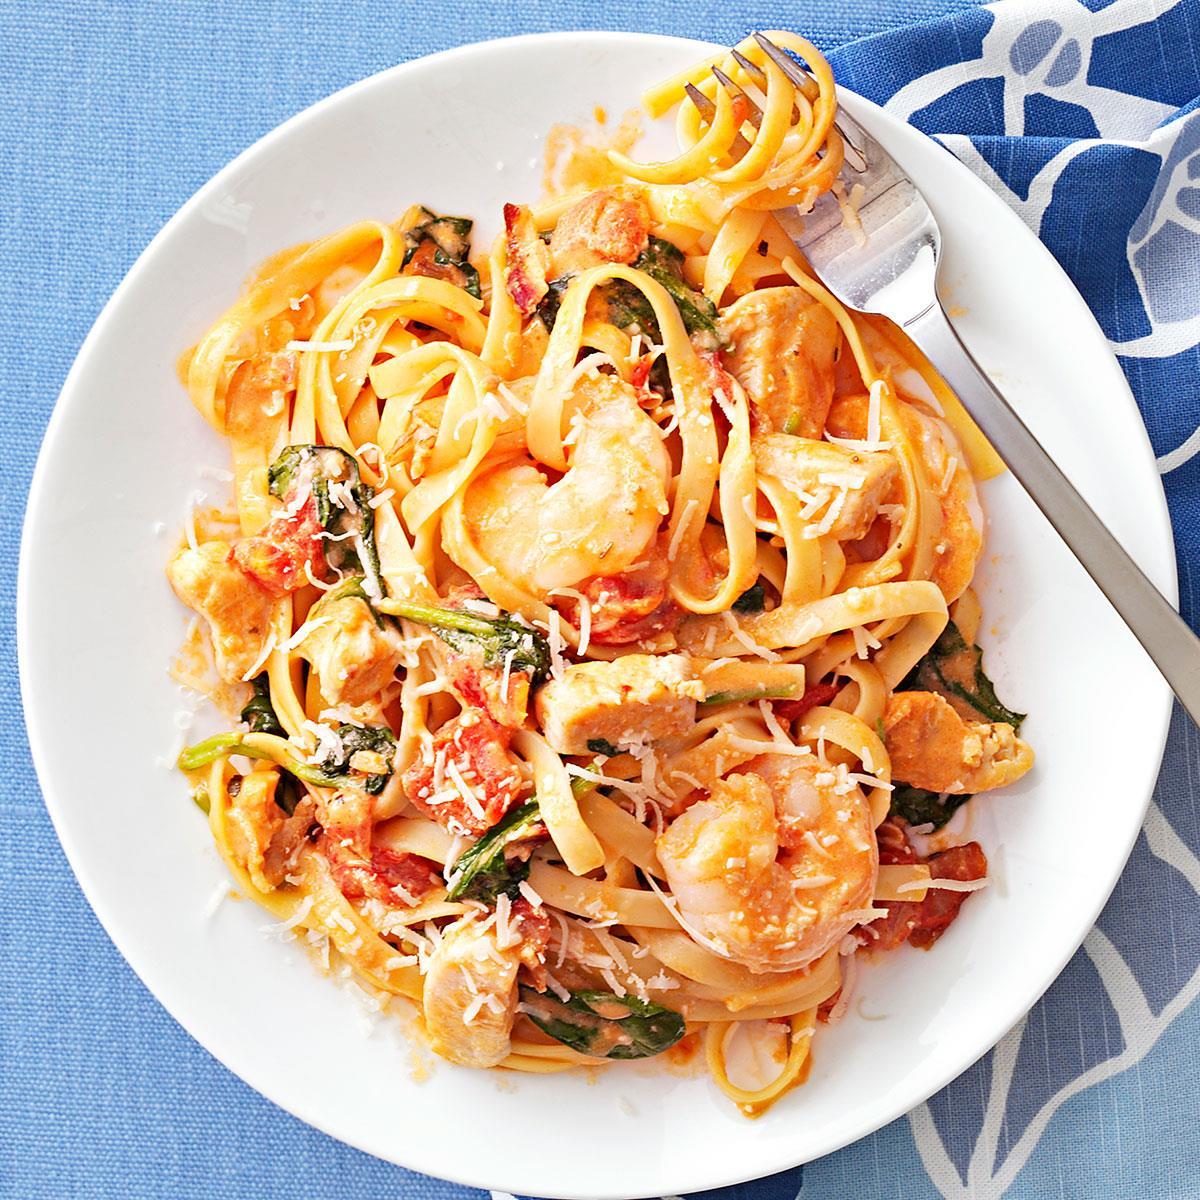 Chicken shrimp fettuccine recipe taste of home forumfinder Image collections